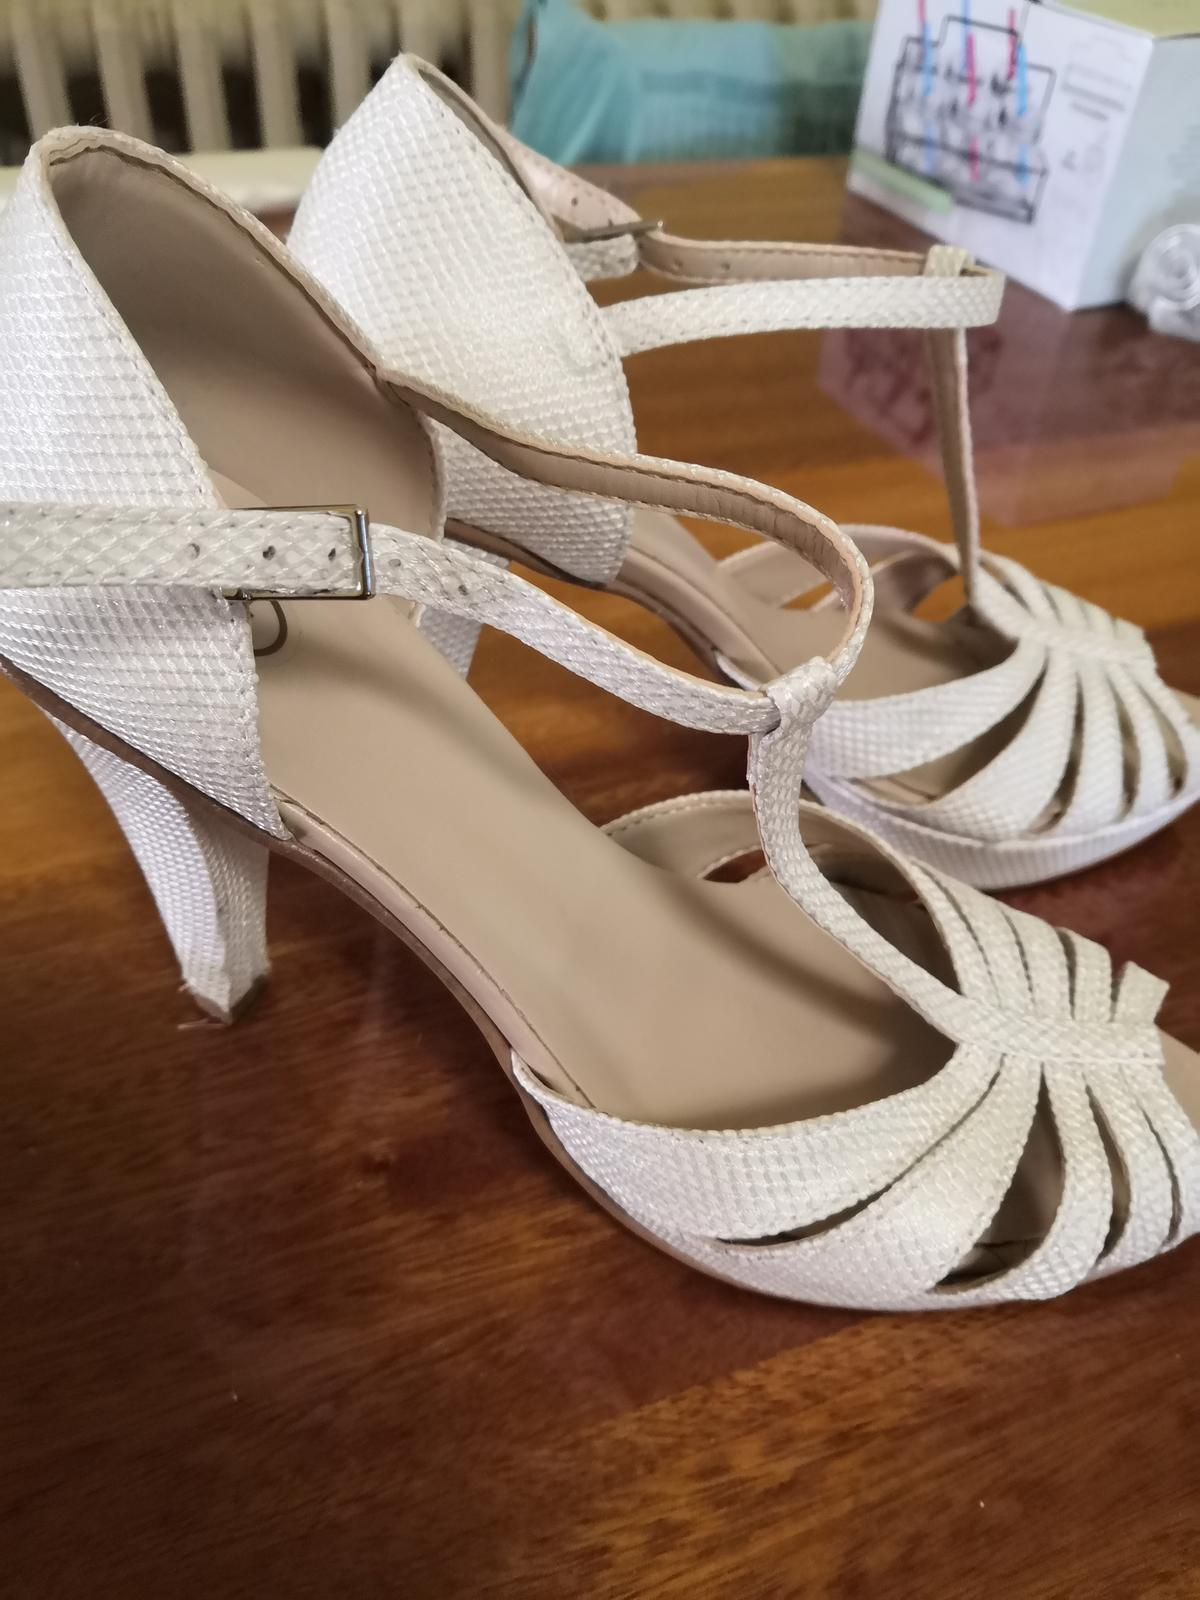 Svadobné sandálky - Obrázok č. 4